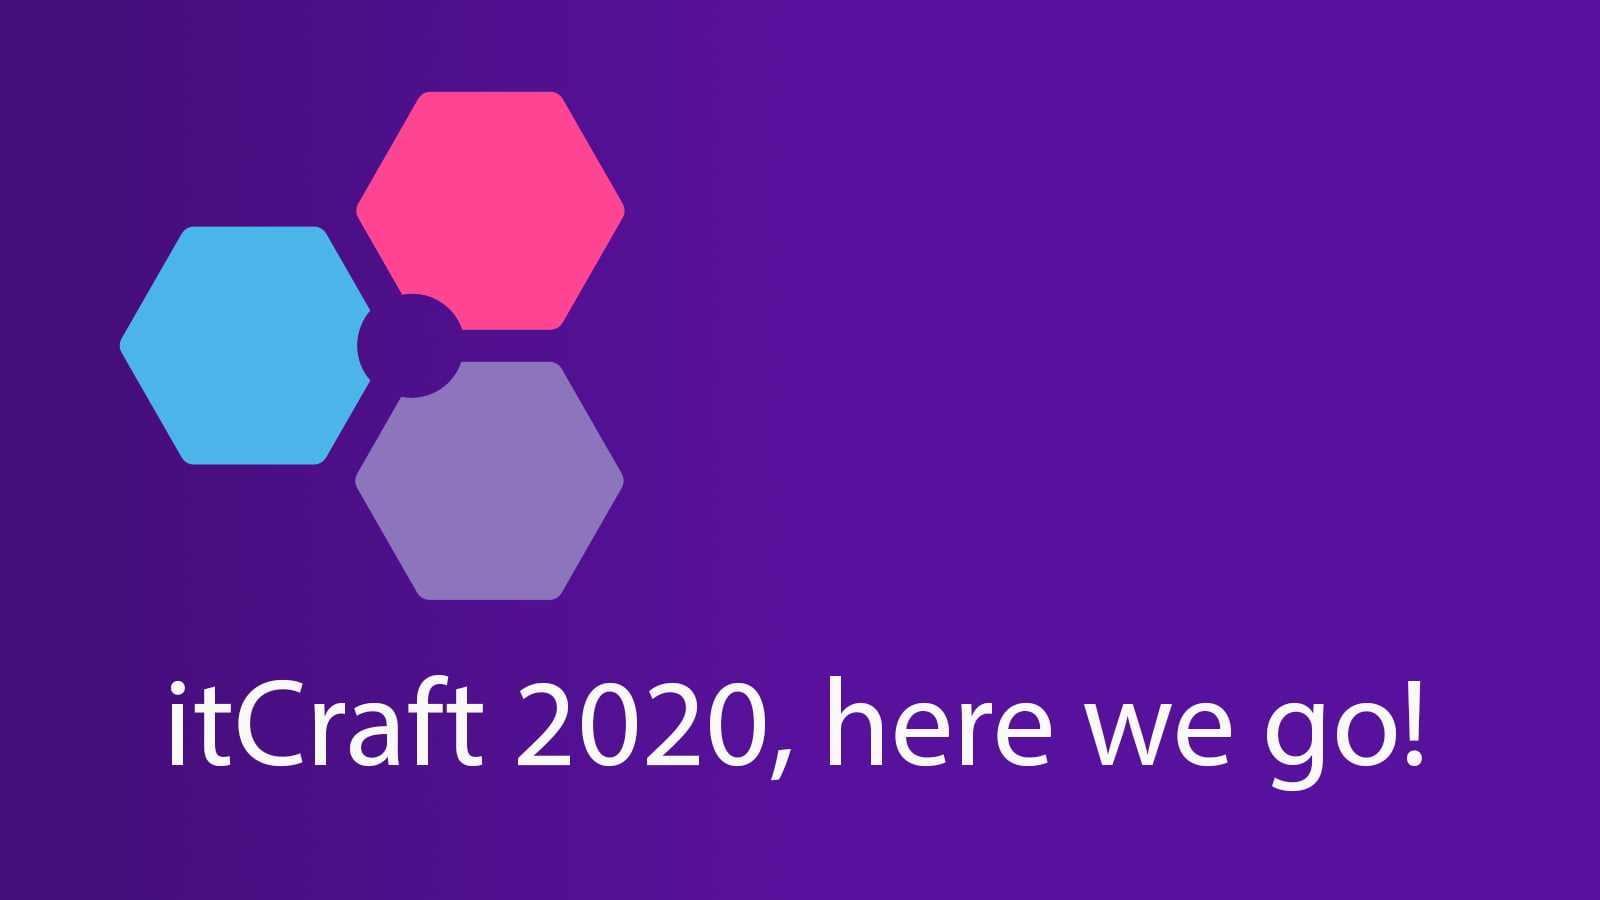 itCraft 2020